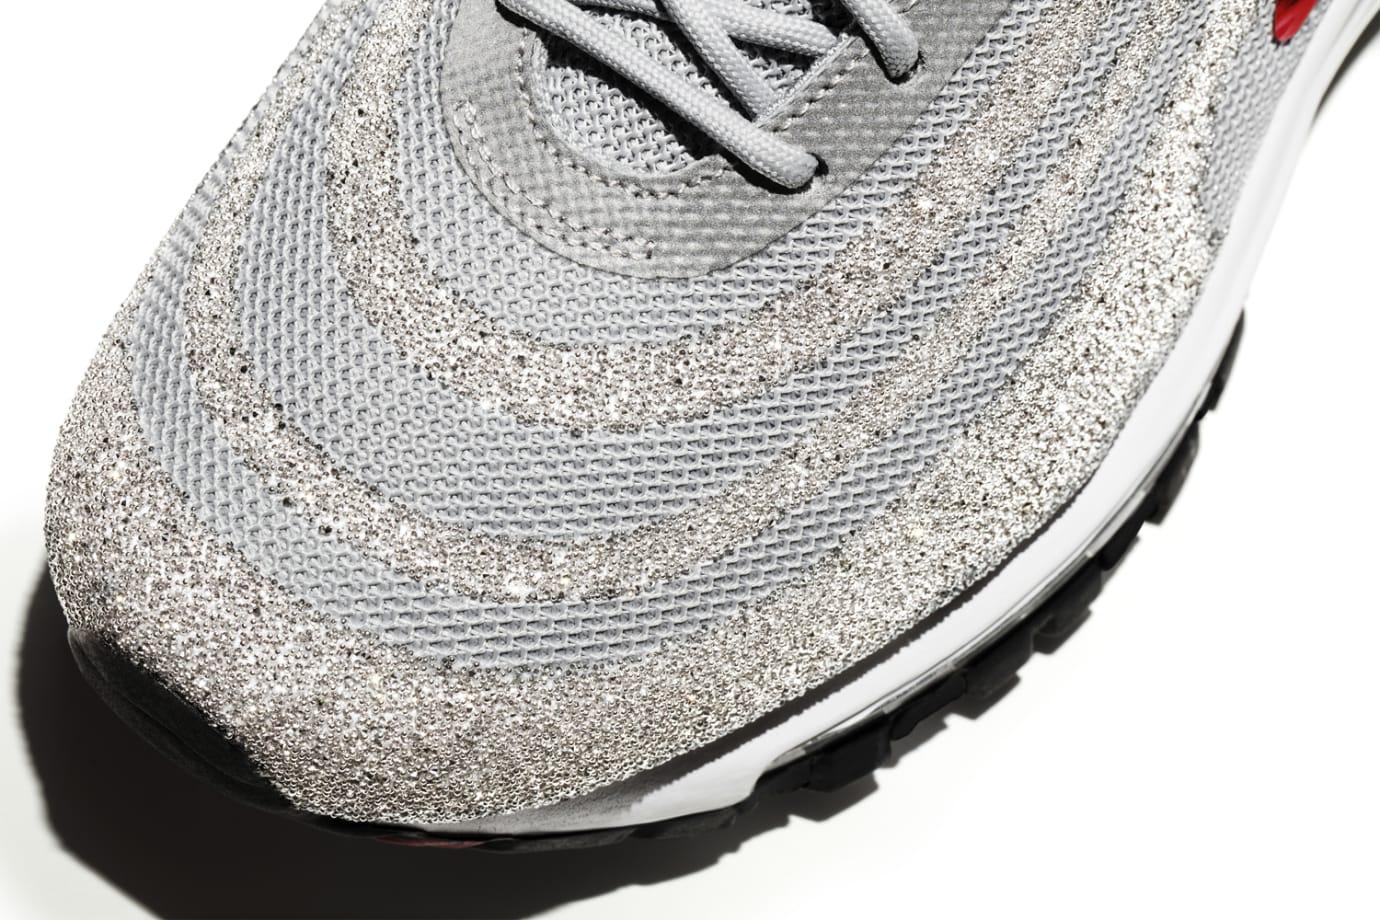 Image via Nike Nike Air Max 97 Swarovski Crystal Silver Toe 4b93af71b4e3